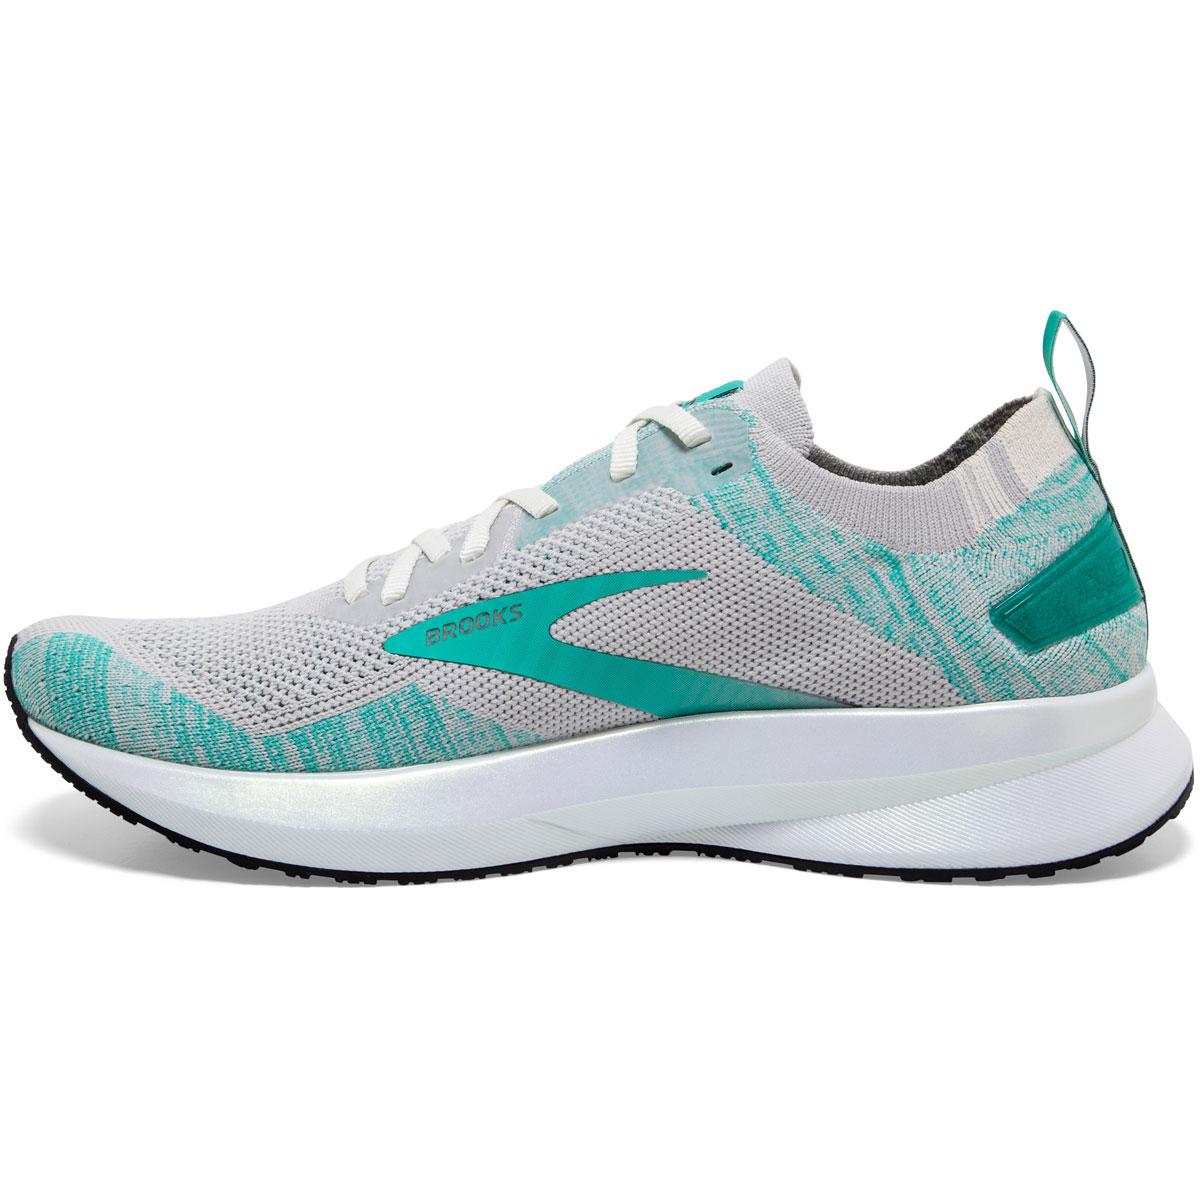 Women's Brooks Levitate 4 Running Shoe - Color: Antarctica/Atlantis/White - Size: 5.5 - Width: Regular, Antarctica/Atlantis/White, large, image 3